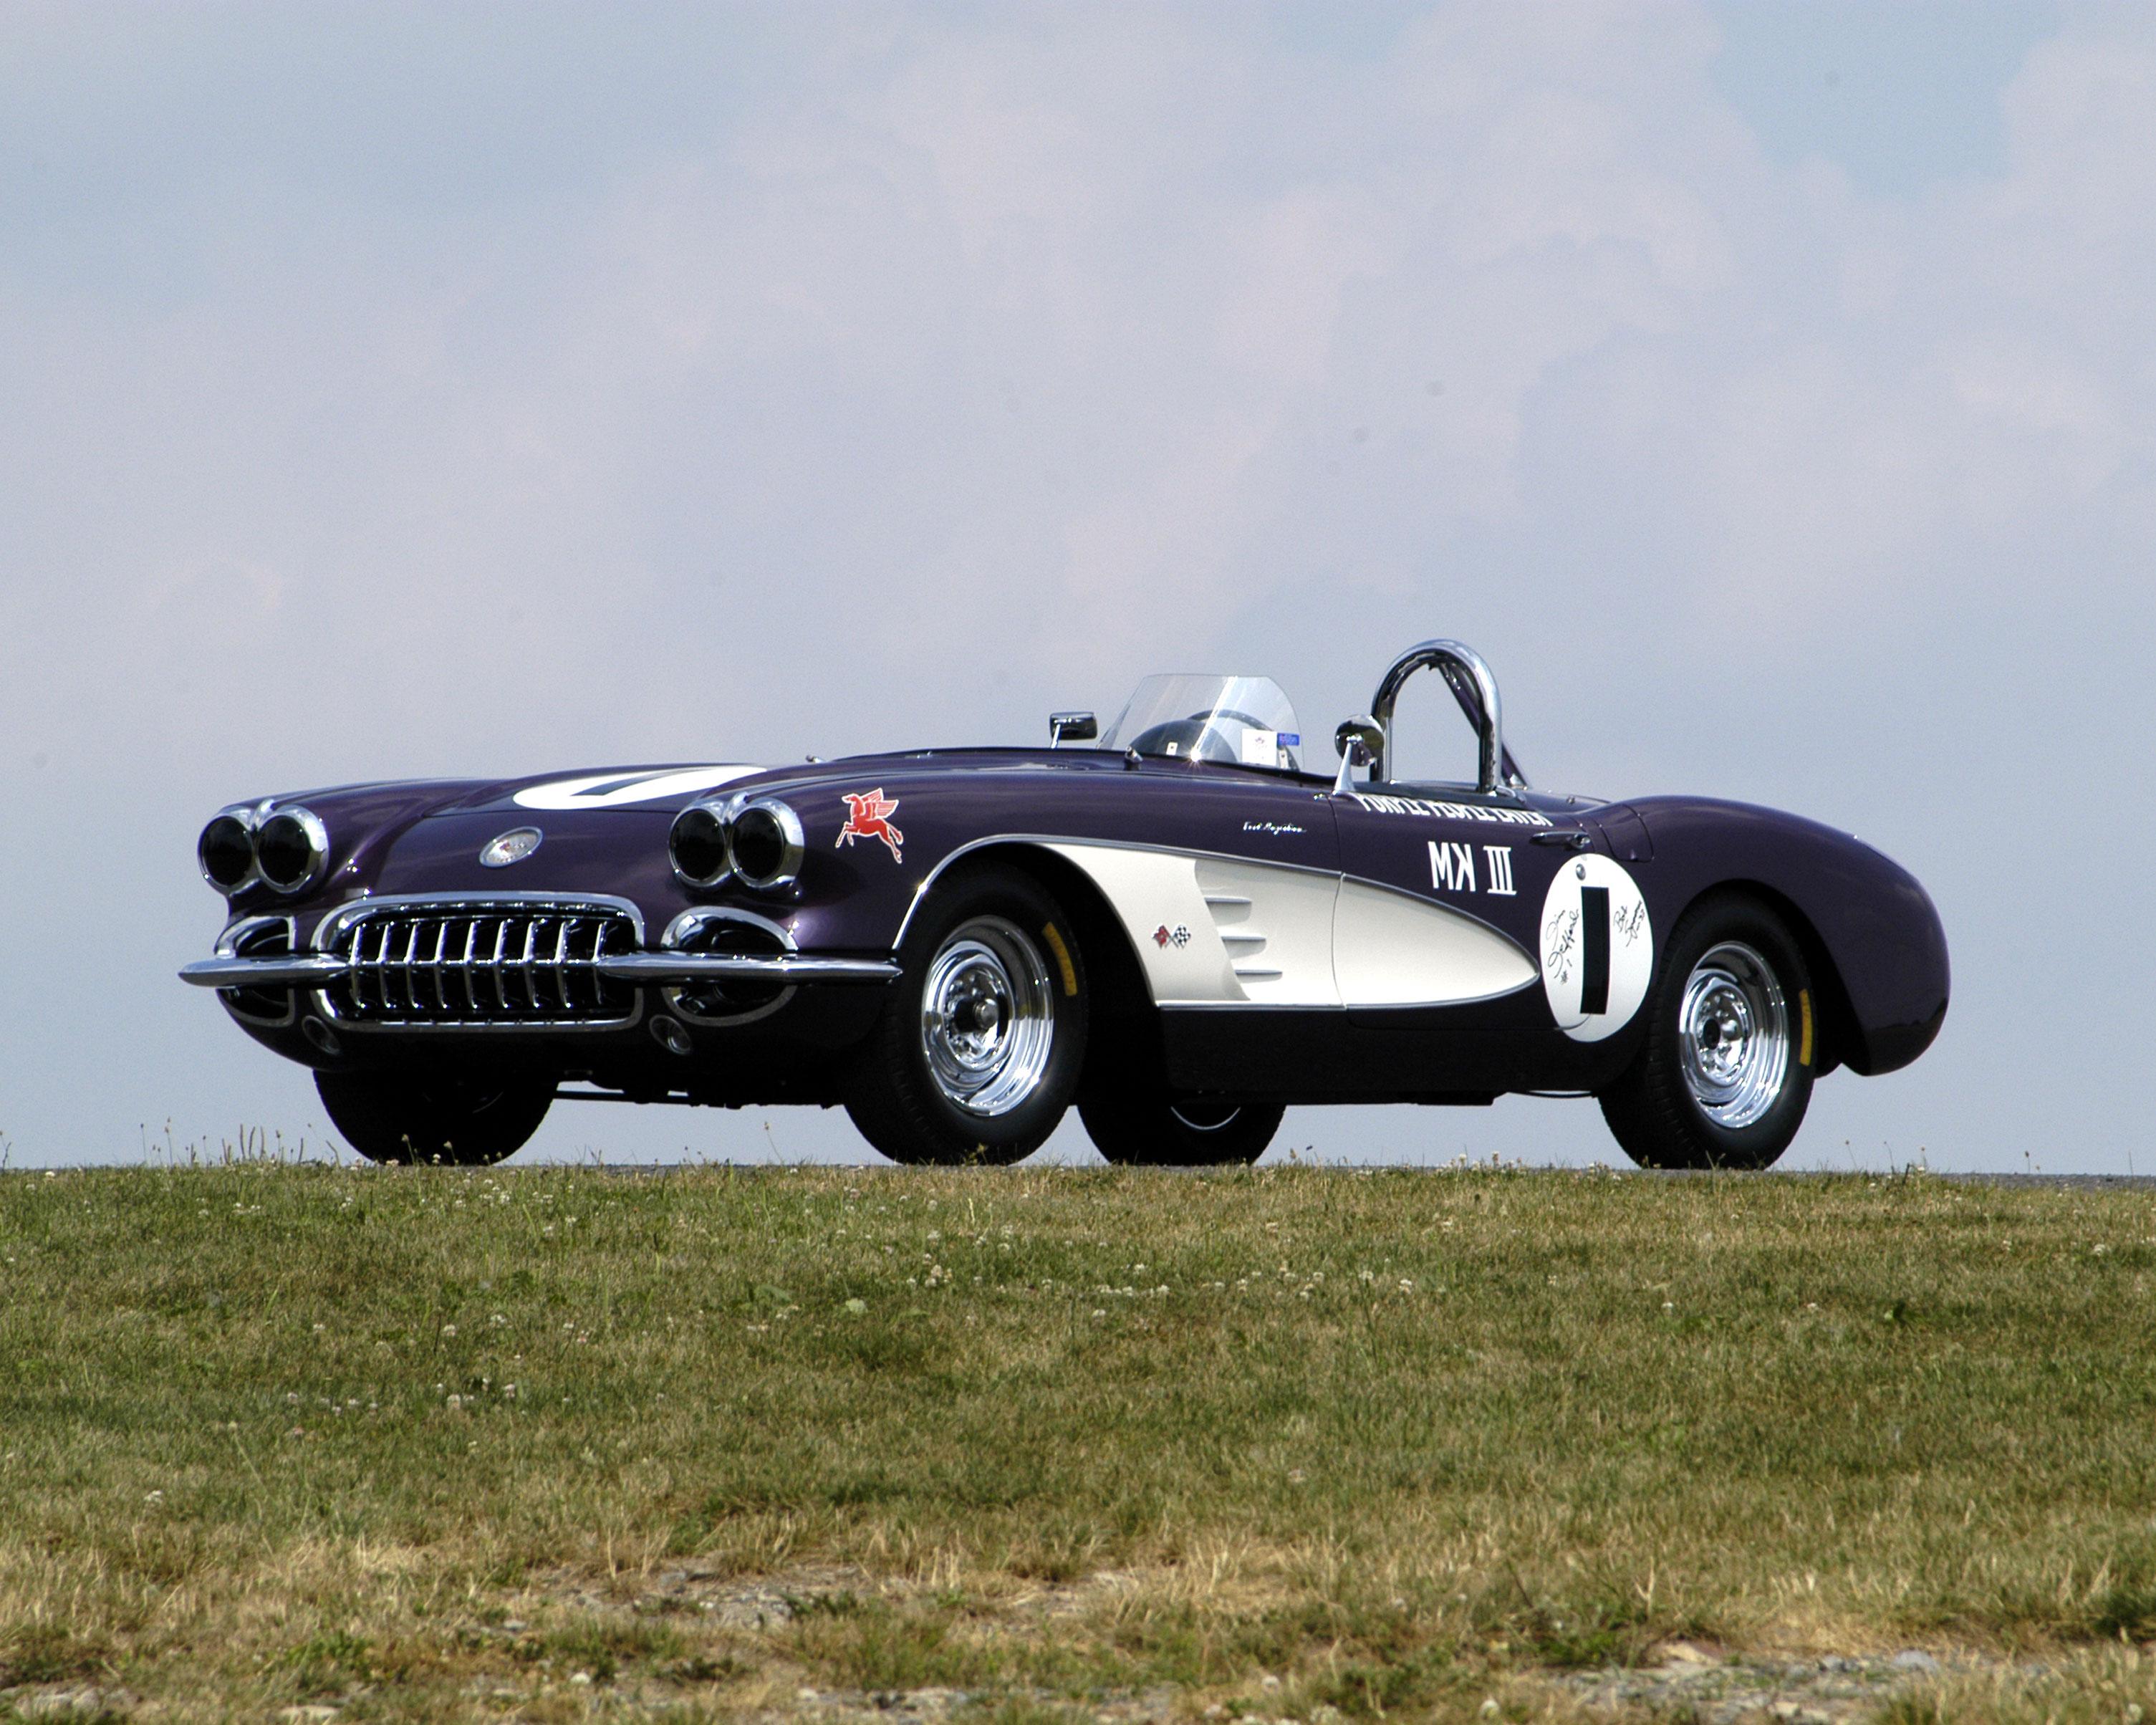 Long-Lost 'Purple People Eater' Corvette Race Car Heads To Amelia Island